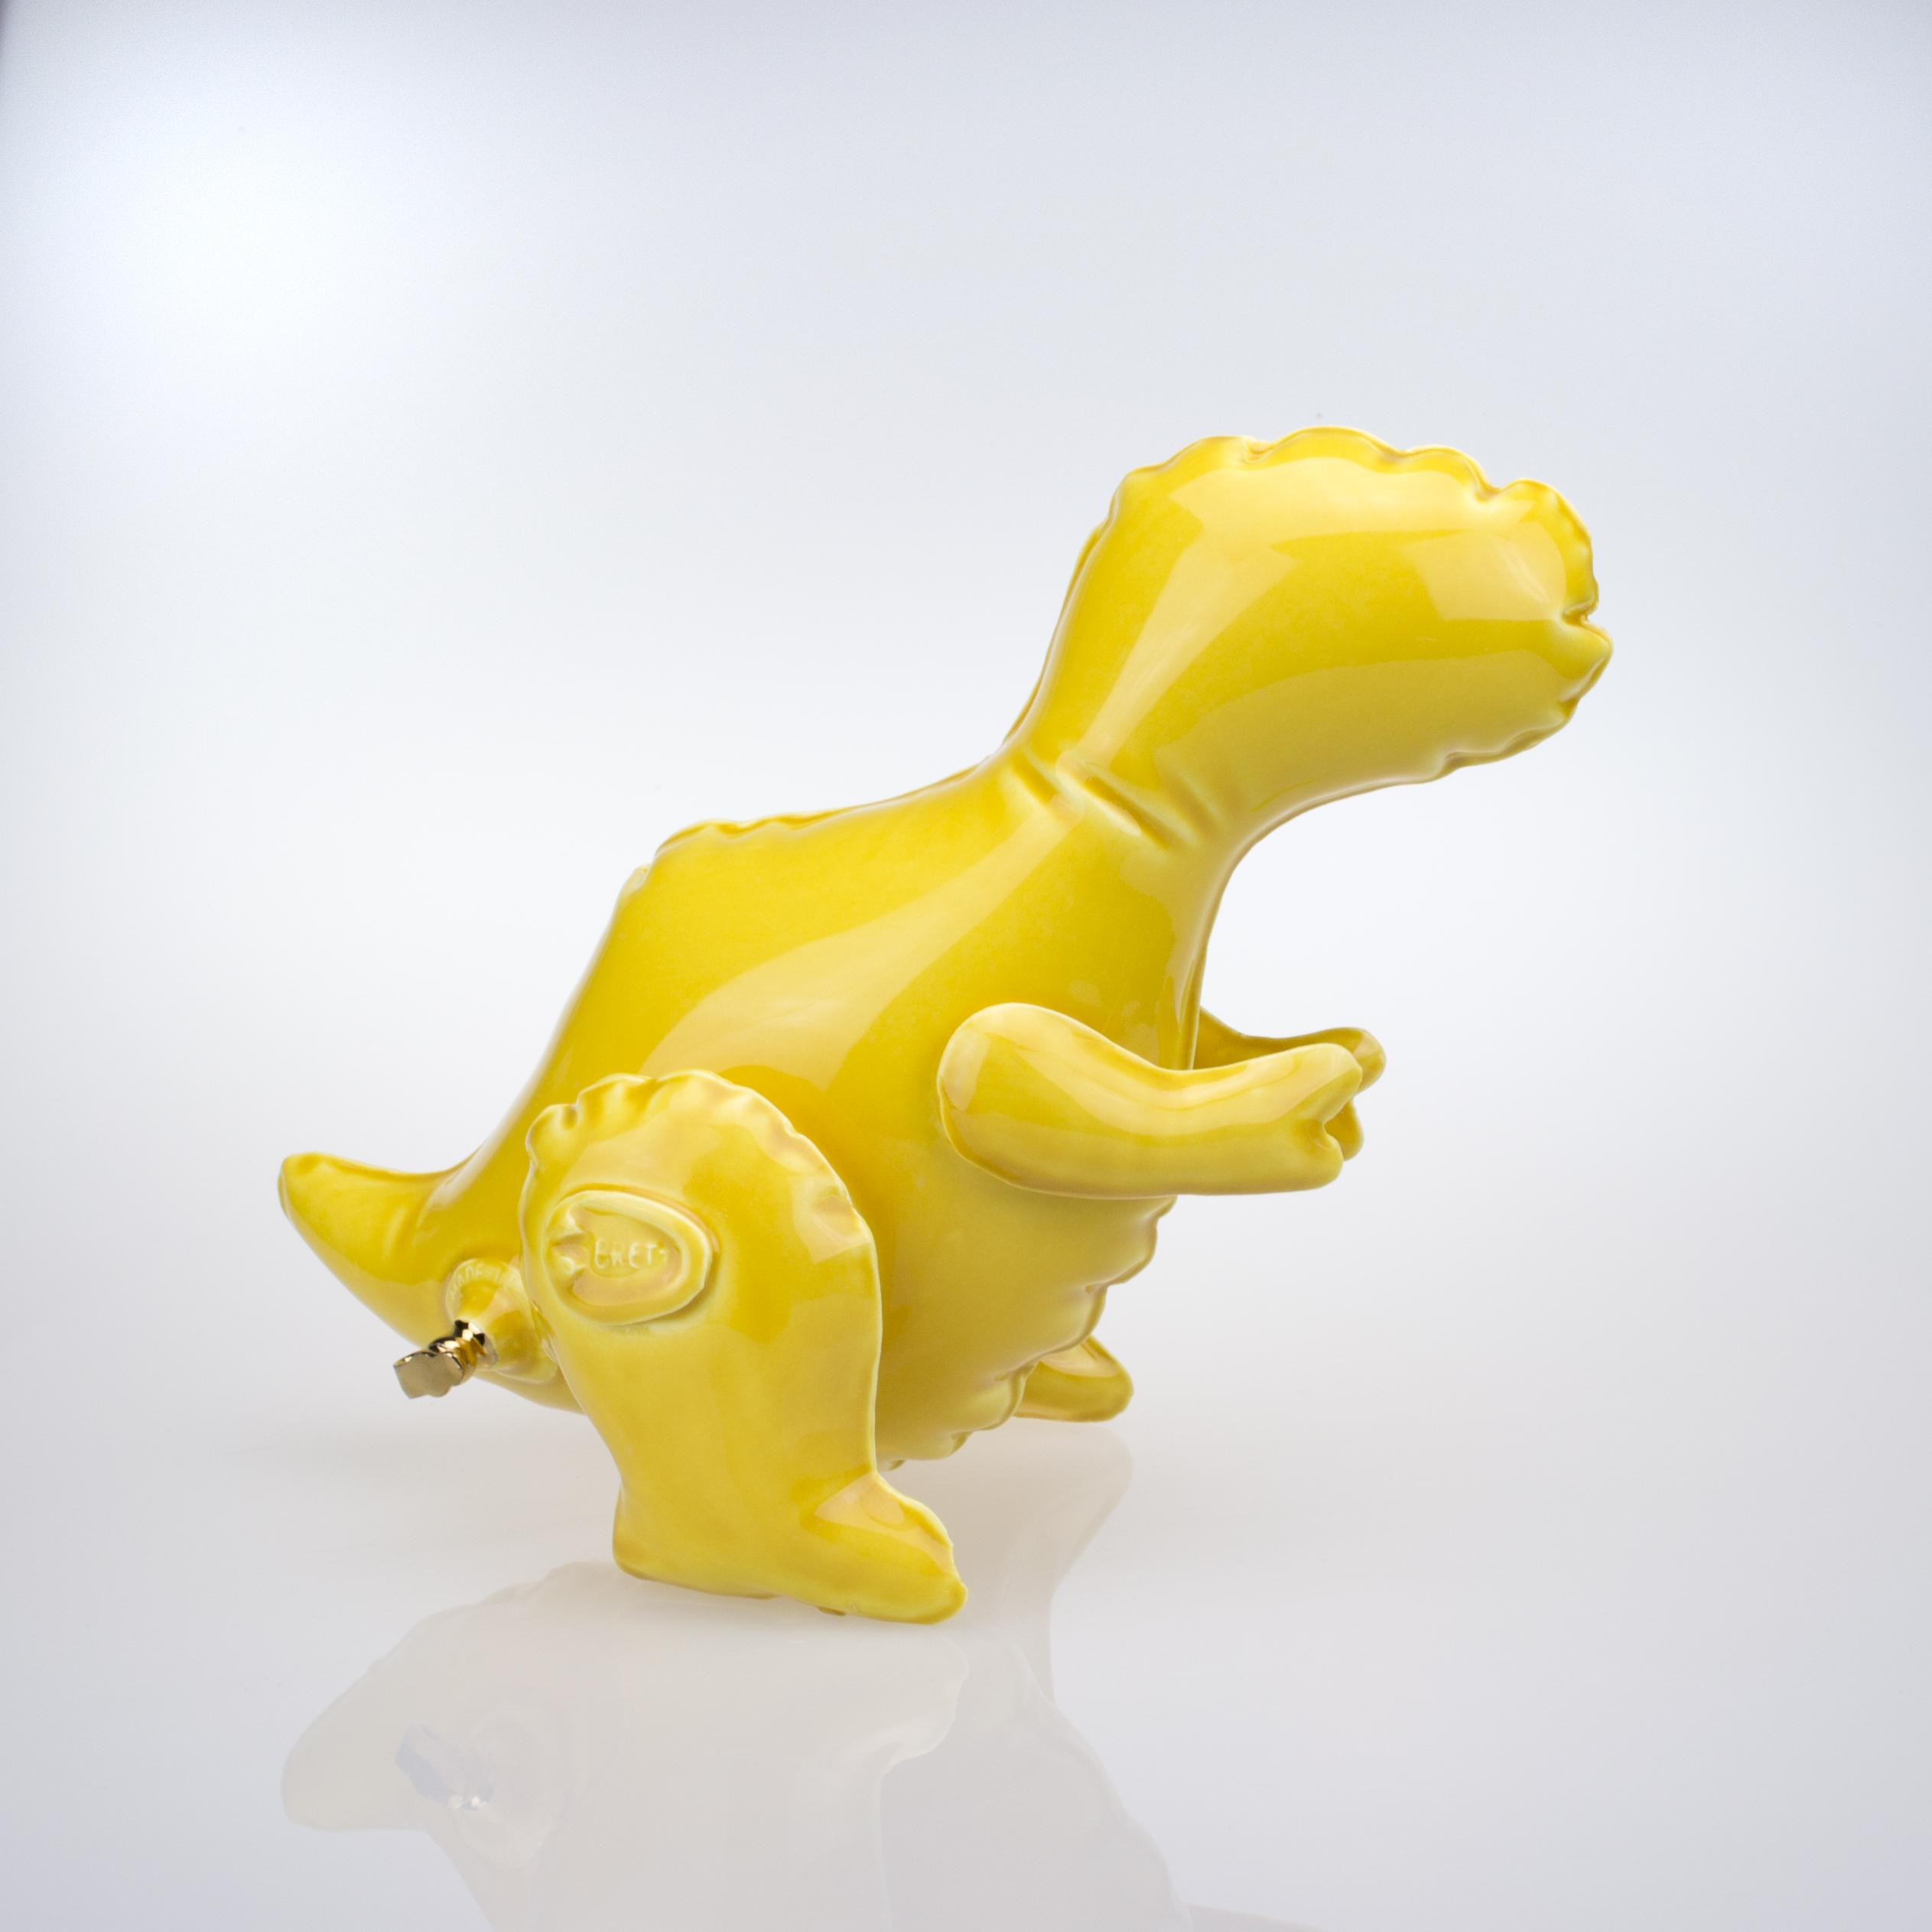 """Small Inflatable Tyrannosaurus Rex (Y)"""